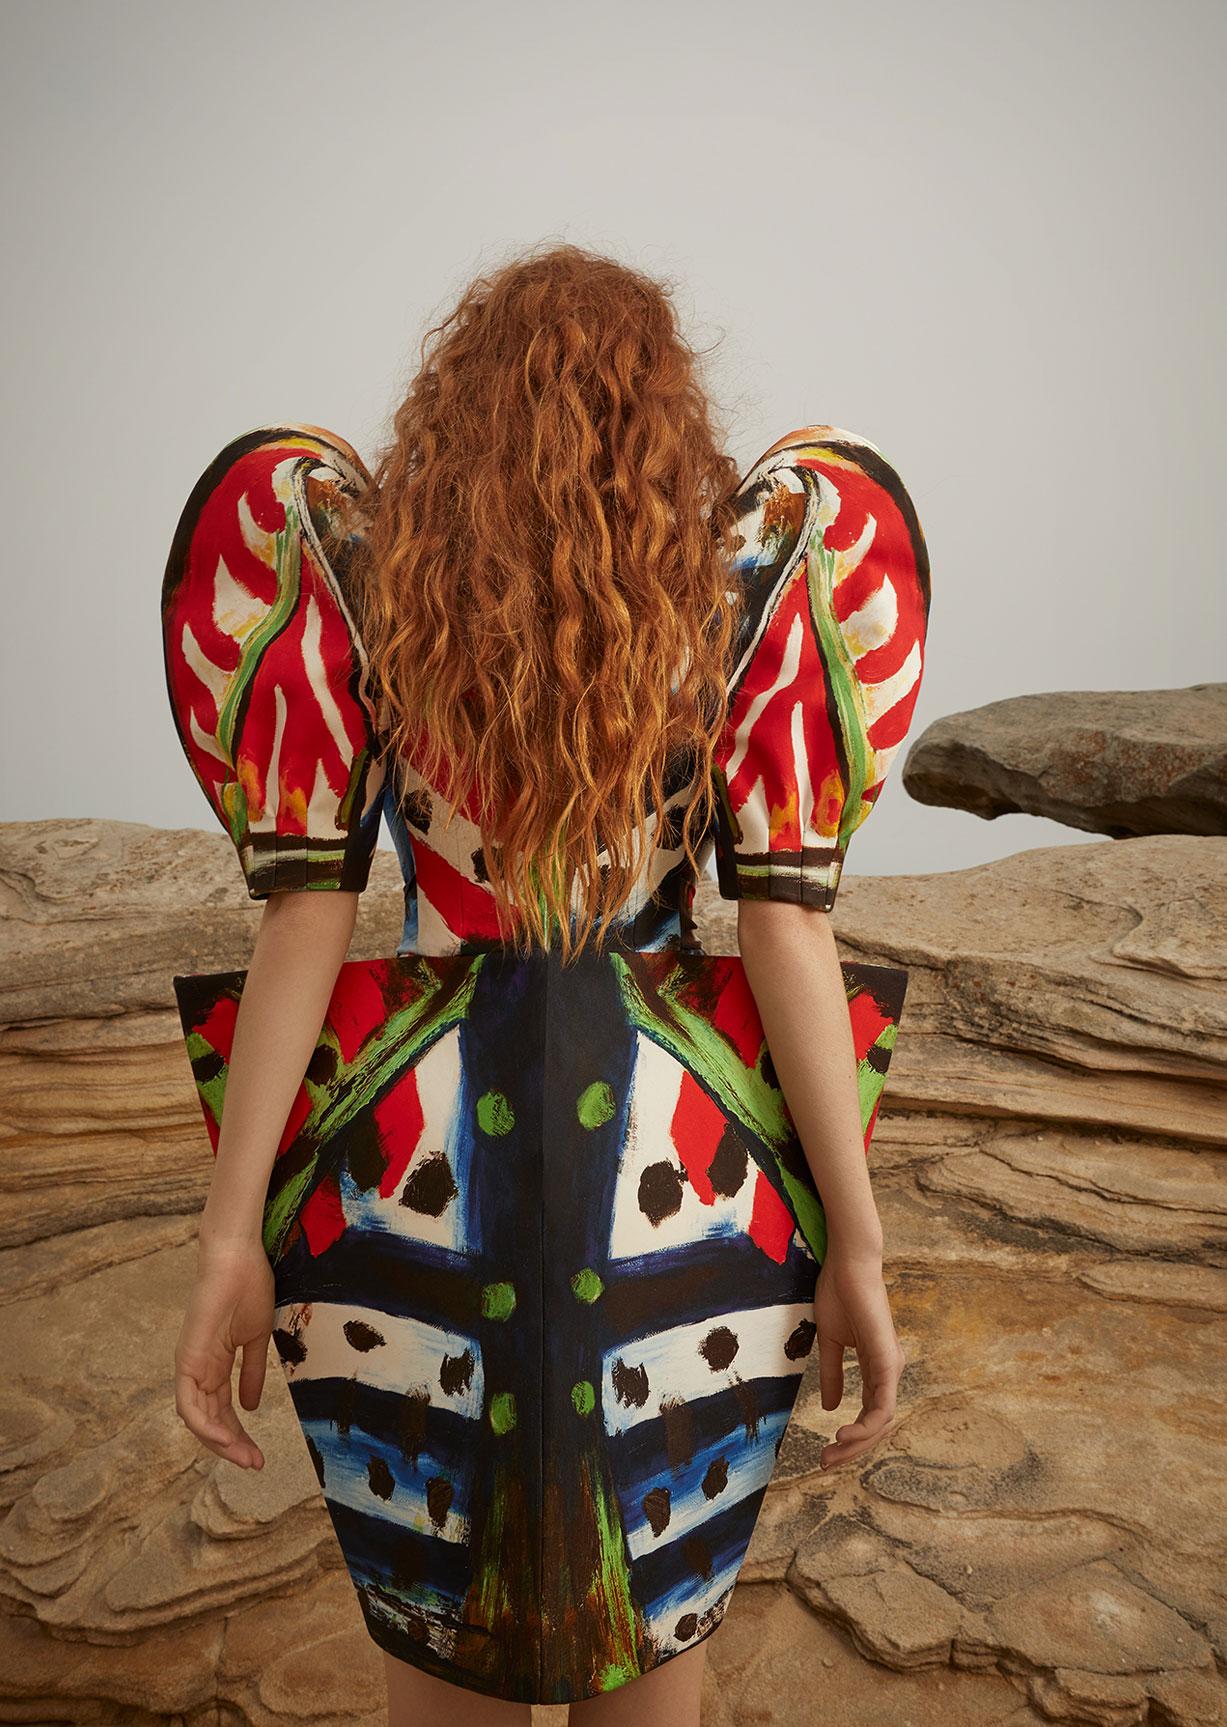 Модный маскарад в журнале Grazia / фото 12